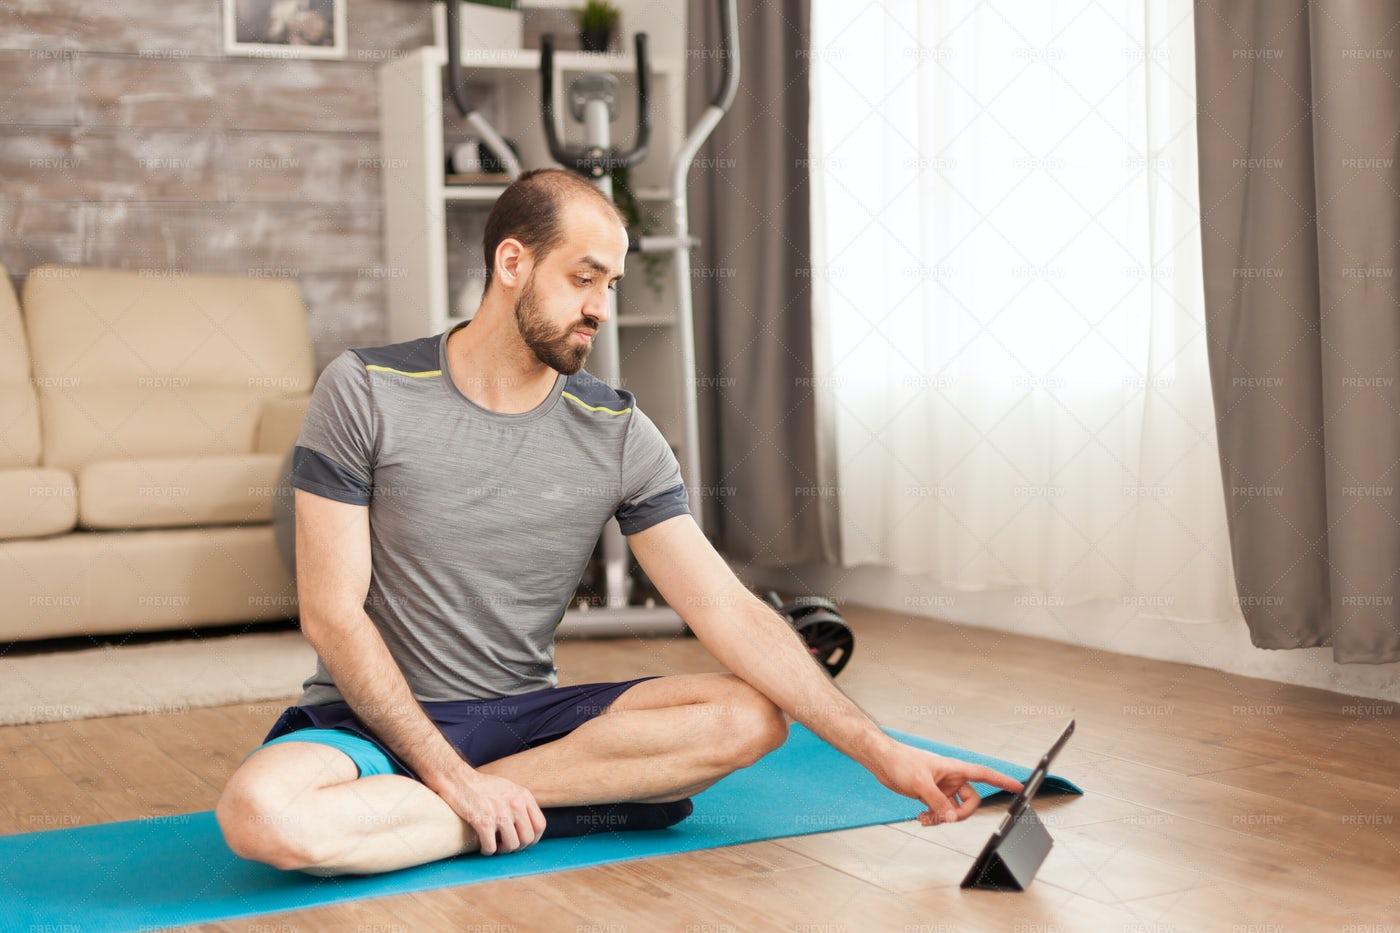 Watching Yoga Online: Stock Photos